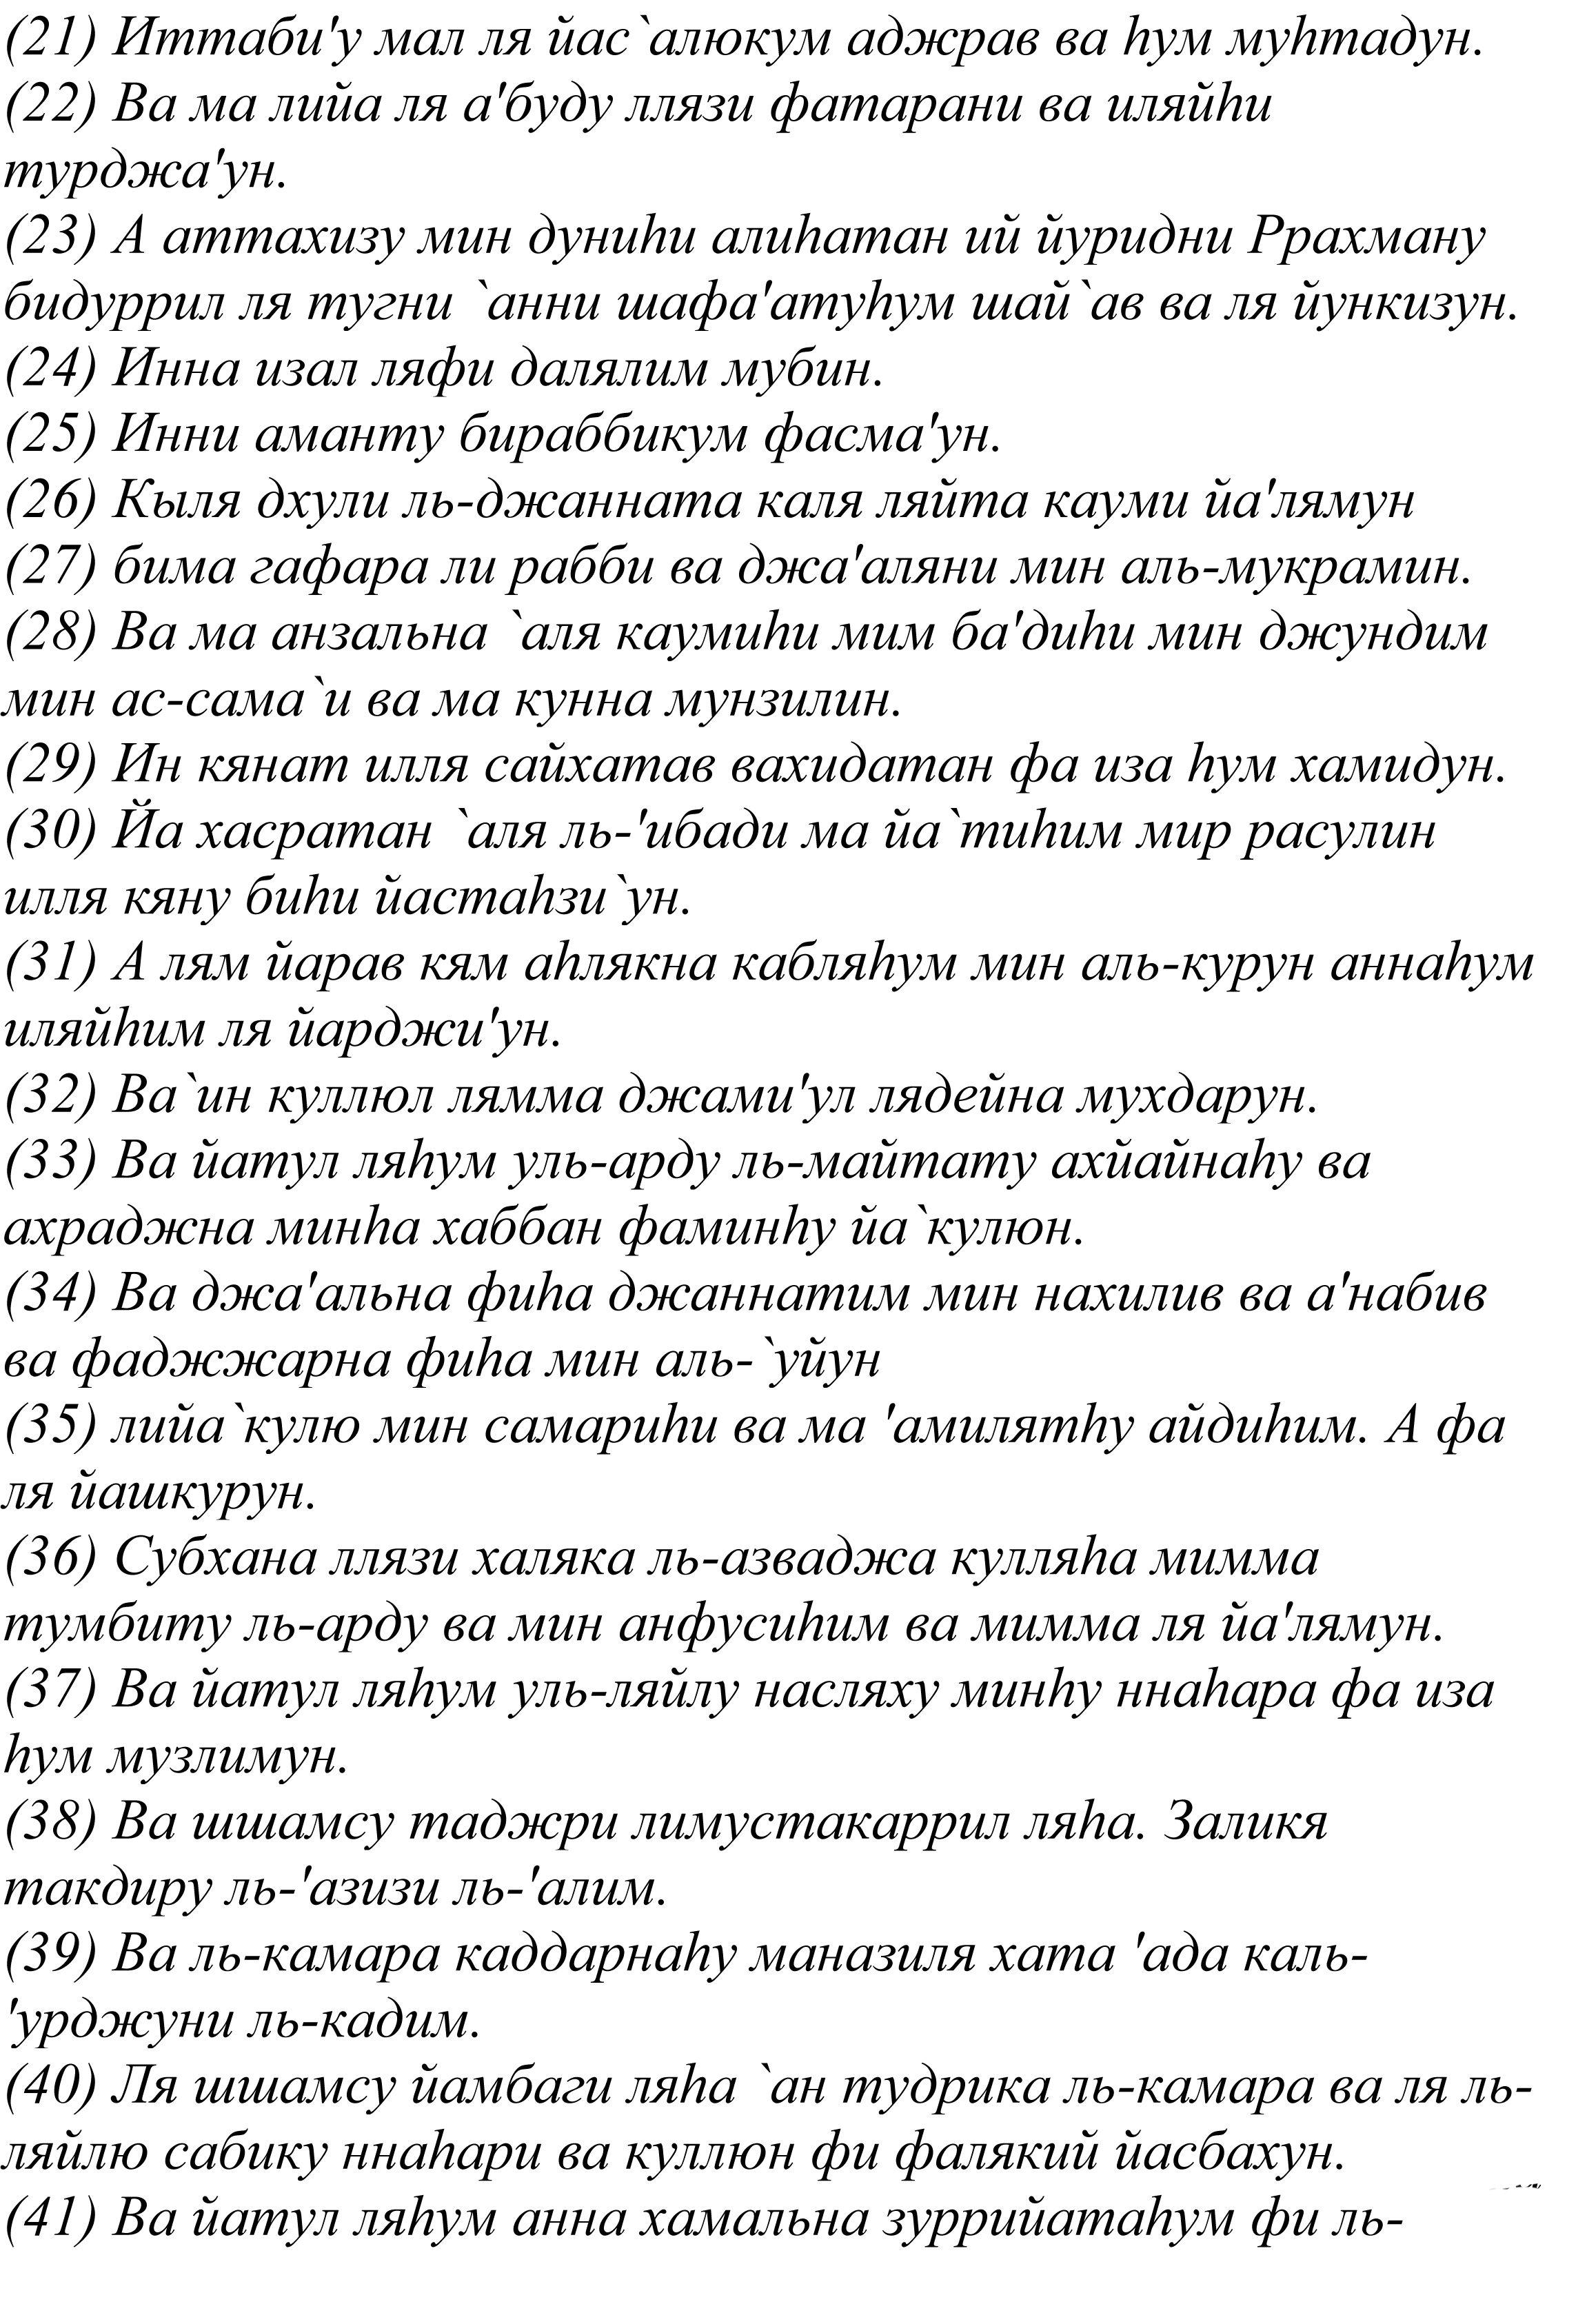 Pin By Uli Bekishov On Odunan Words Word Search Puzzle English Writing